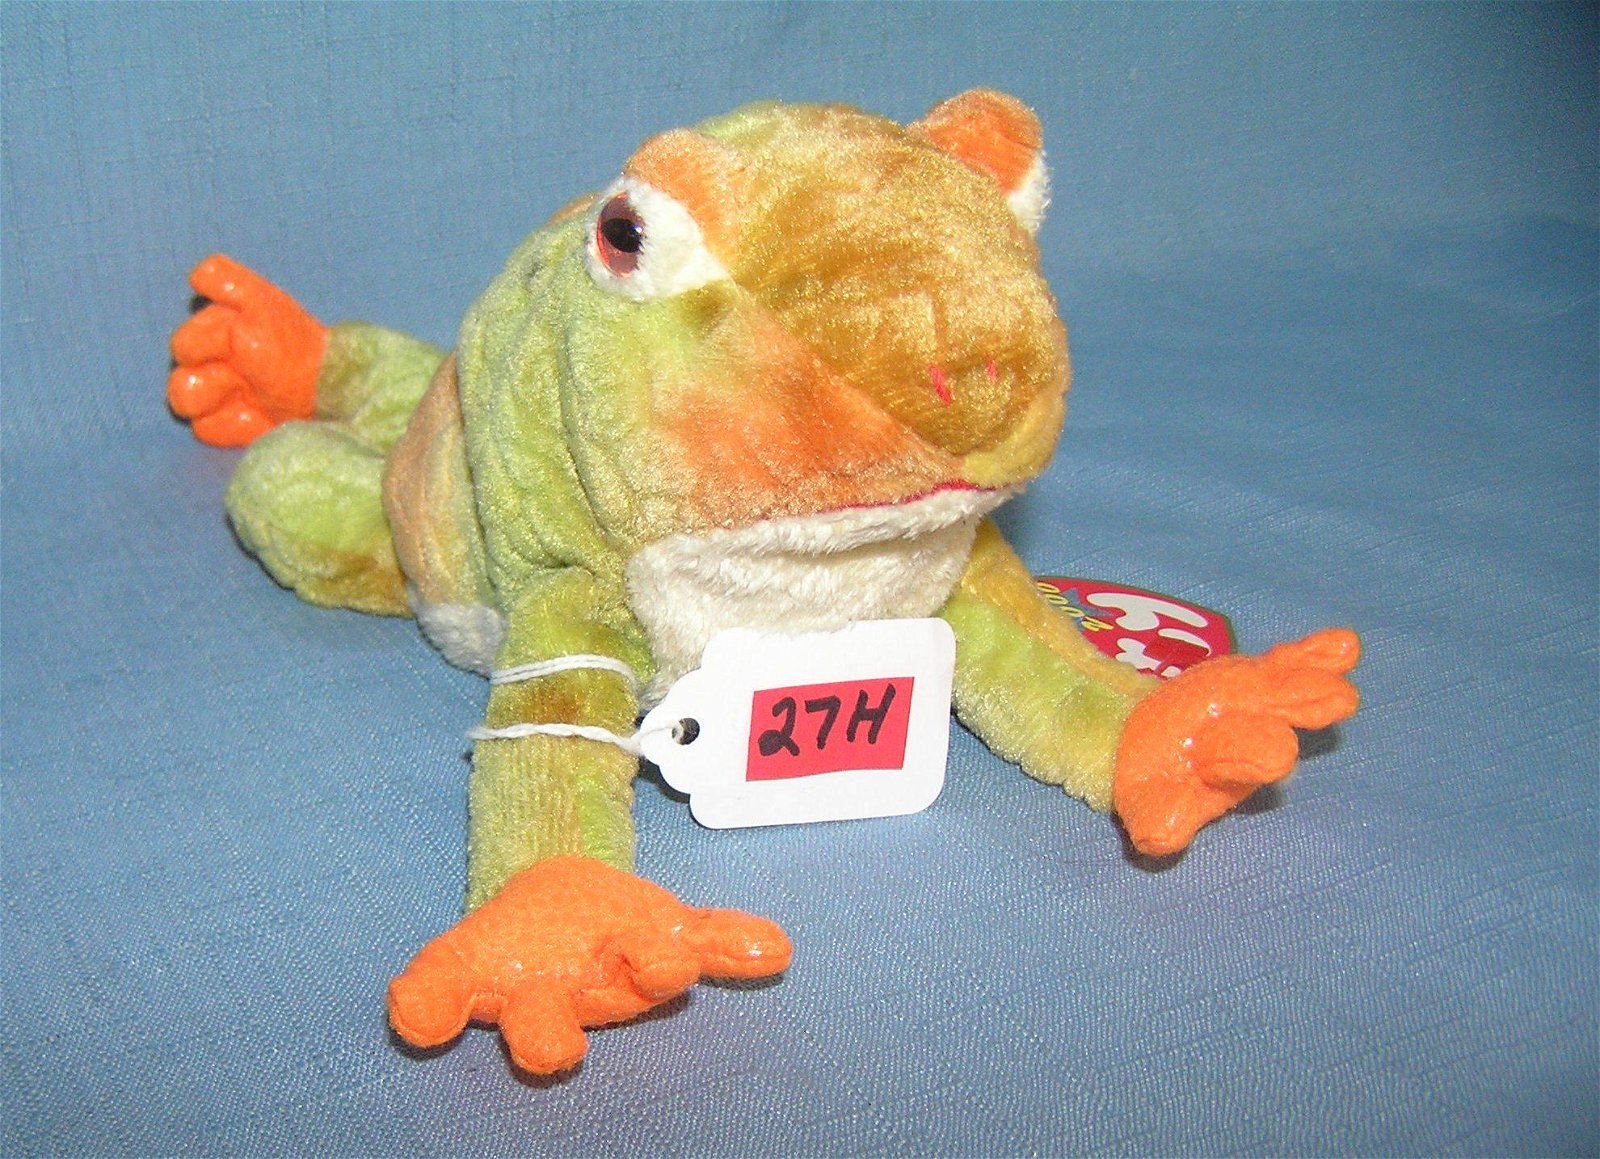 Vintage Prince Beanie Baby frog